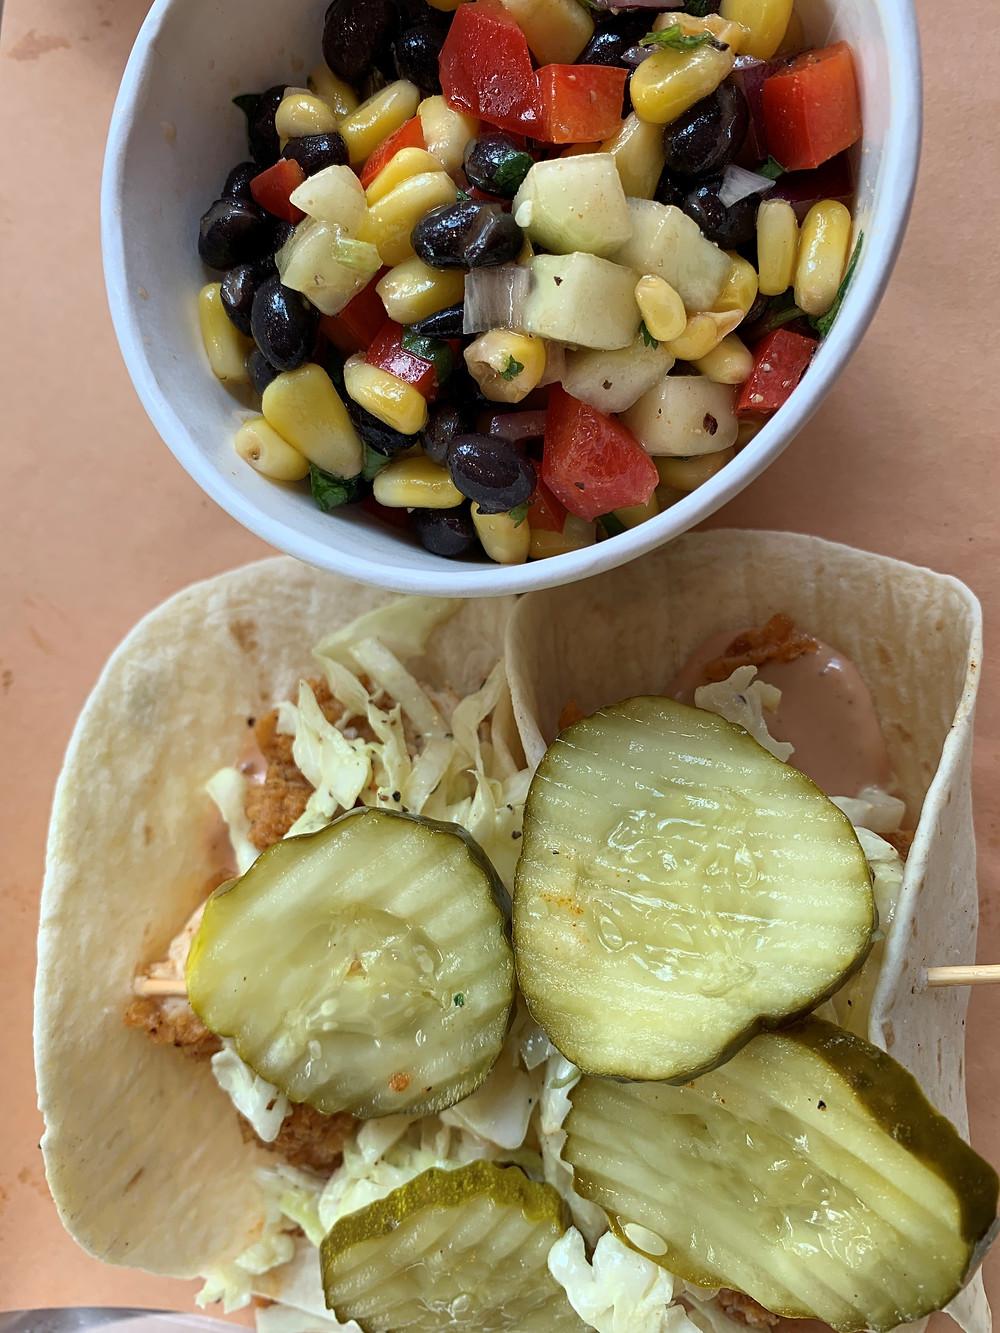 The Cookshack's Chicken Tacos and Texas Caviar